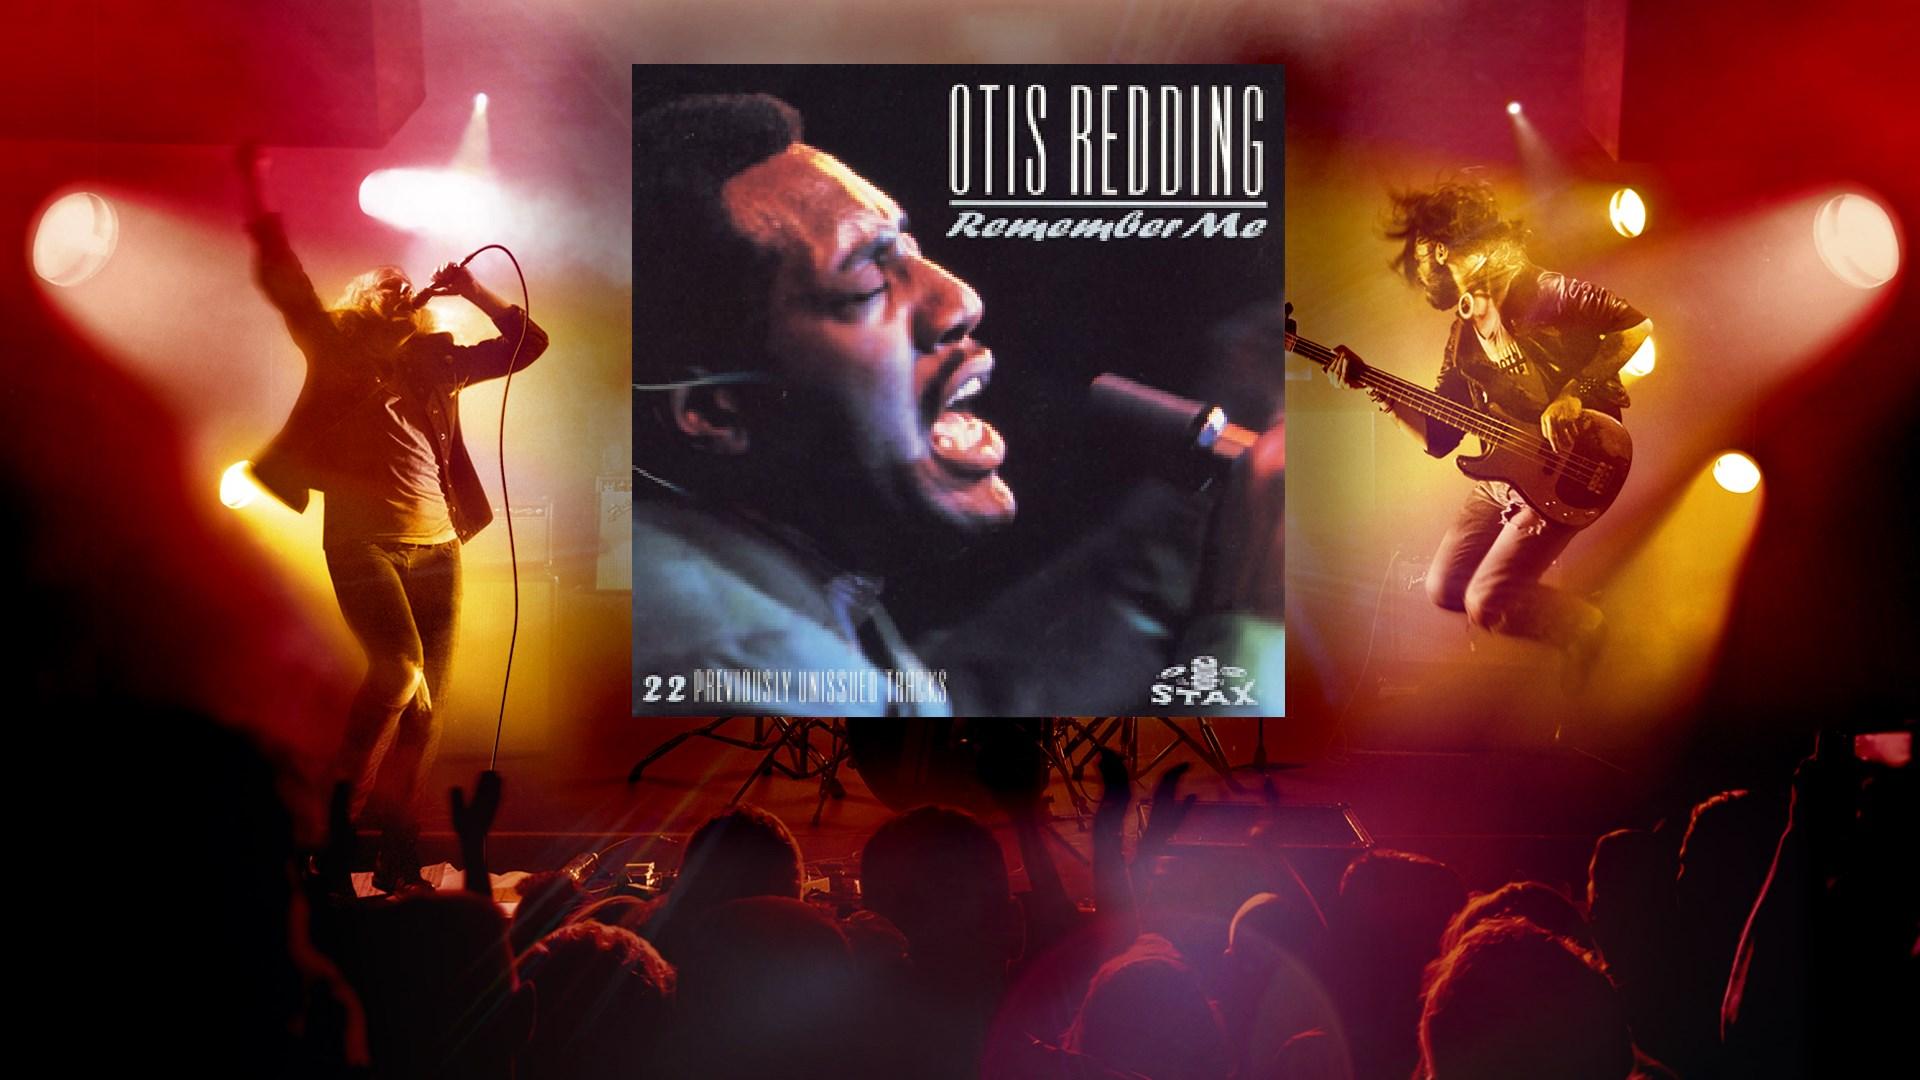 """(Sittin' on the) Dock of the Bay (Take 2)"" - Otis Redding"